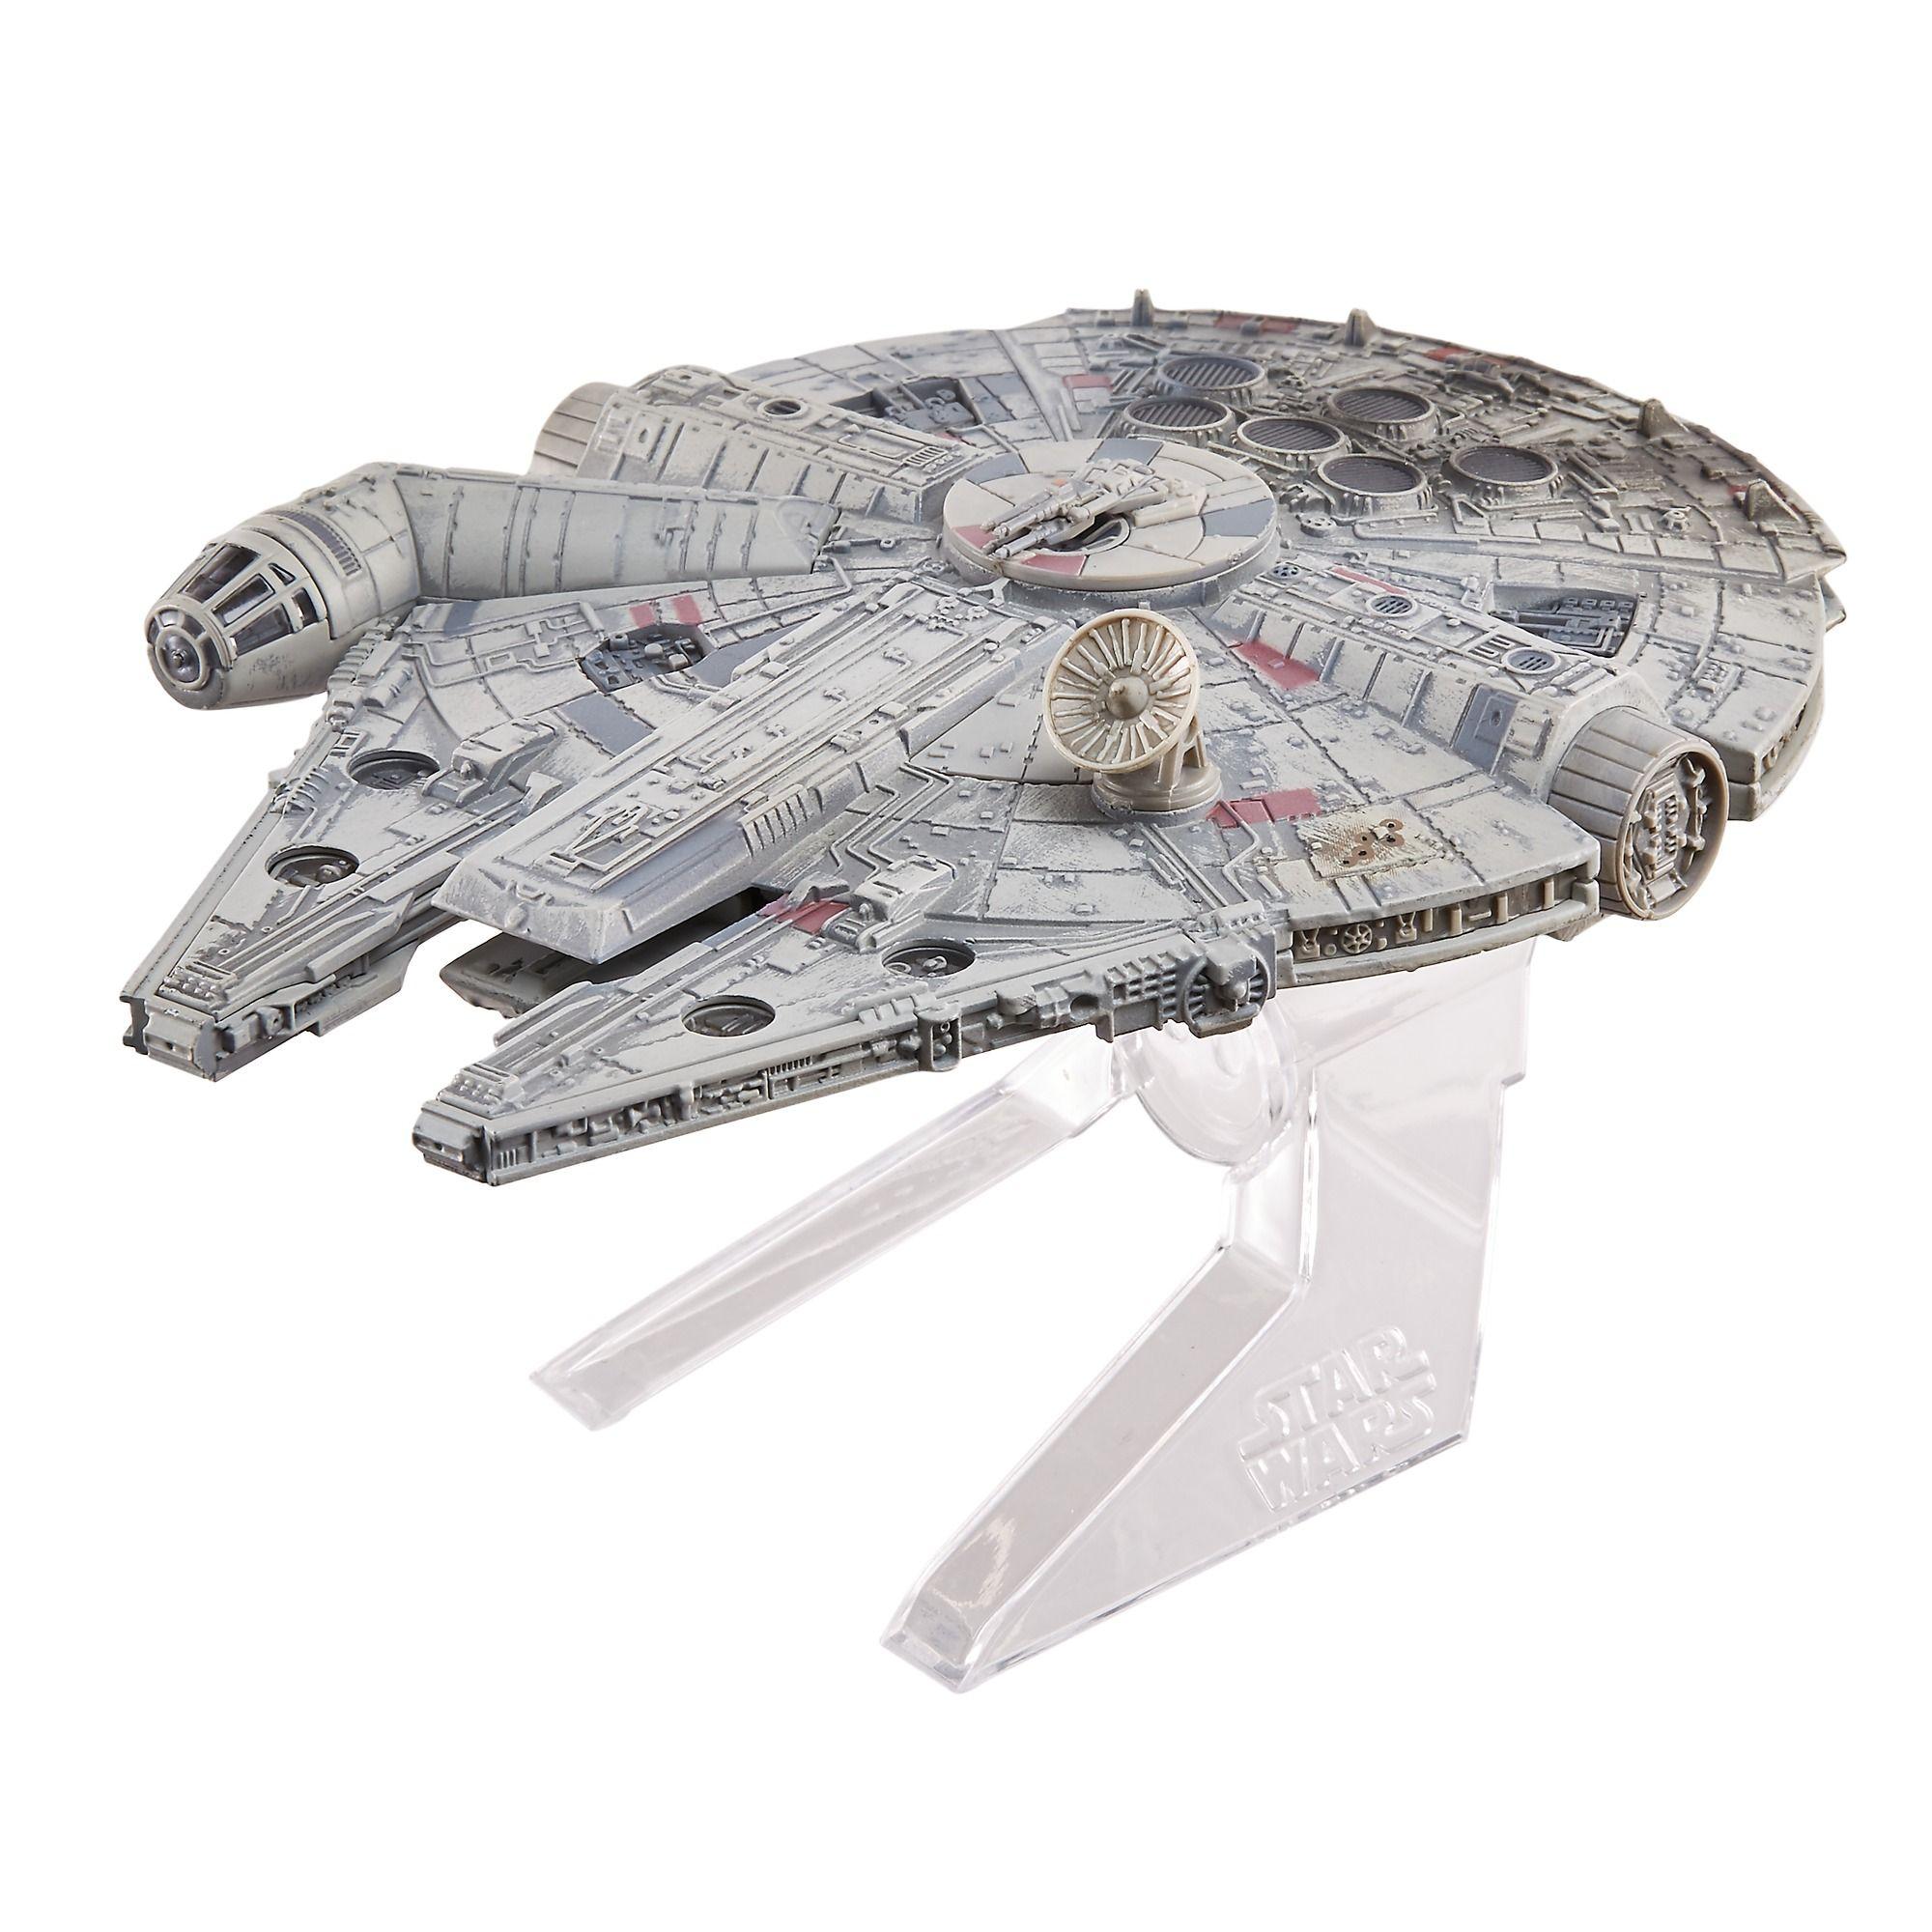 Millennium Falcon From Hot Wheels Hot Wheels Star Wars Millennium Falcon